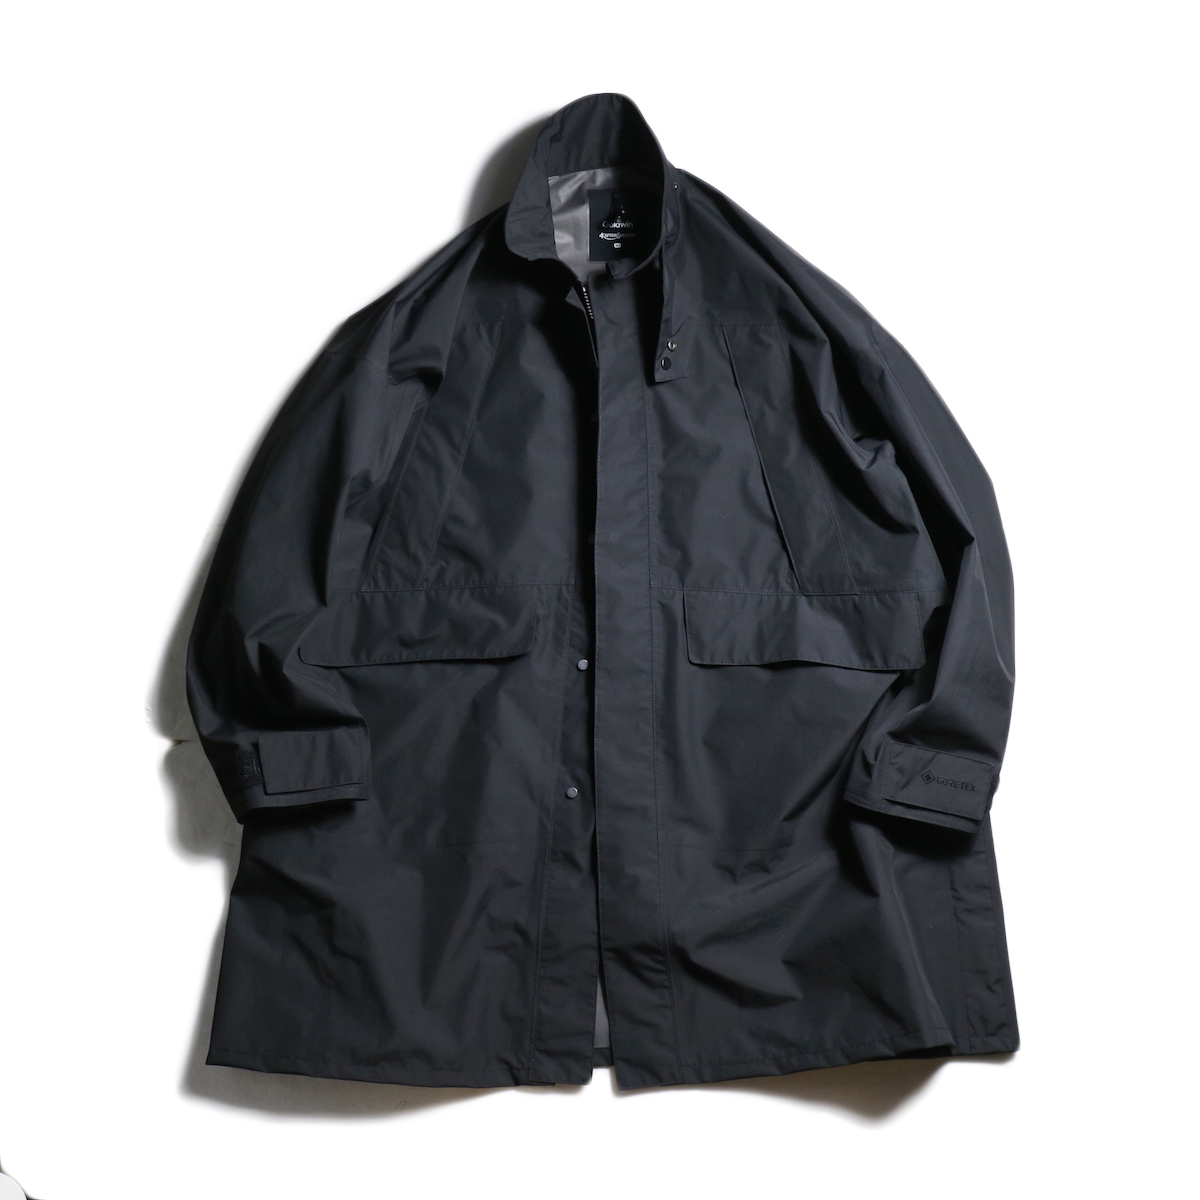 Kaptain Sunshine × Goldwin / Gore-Tex Stand Collar Field Coat (Black)